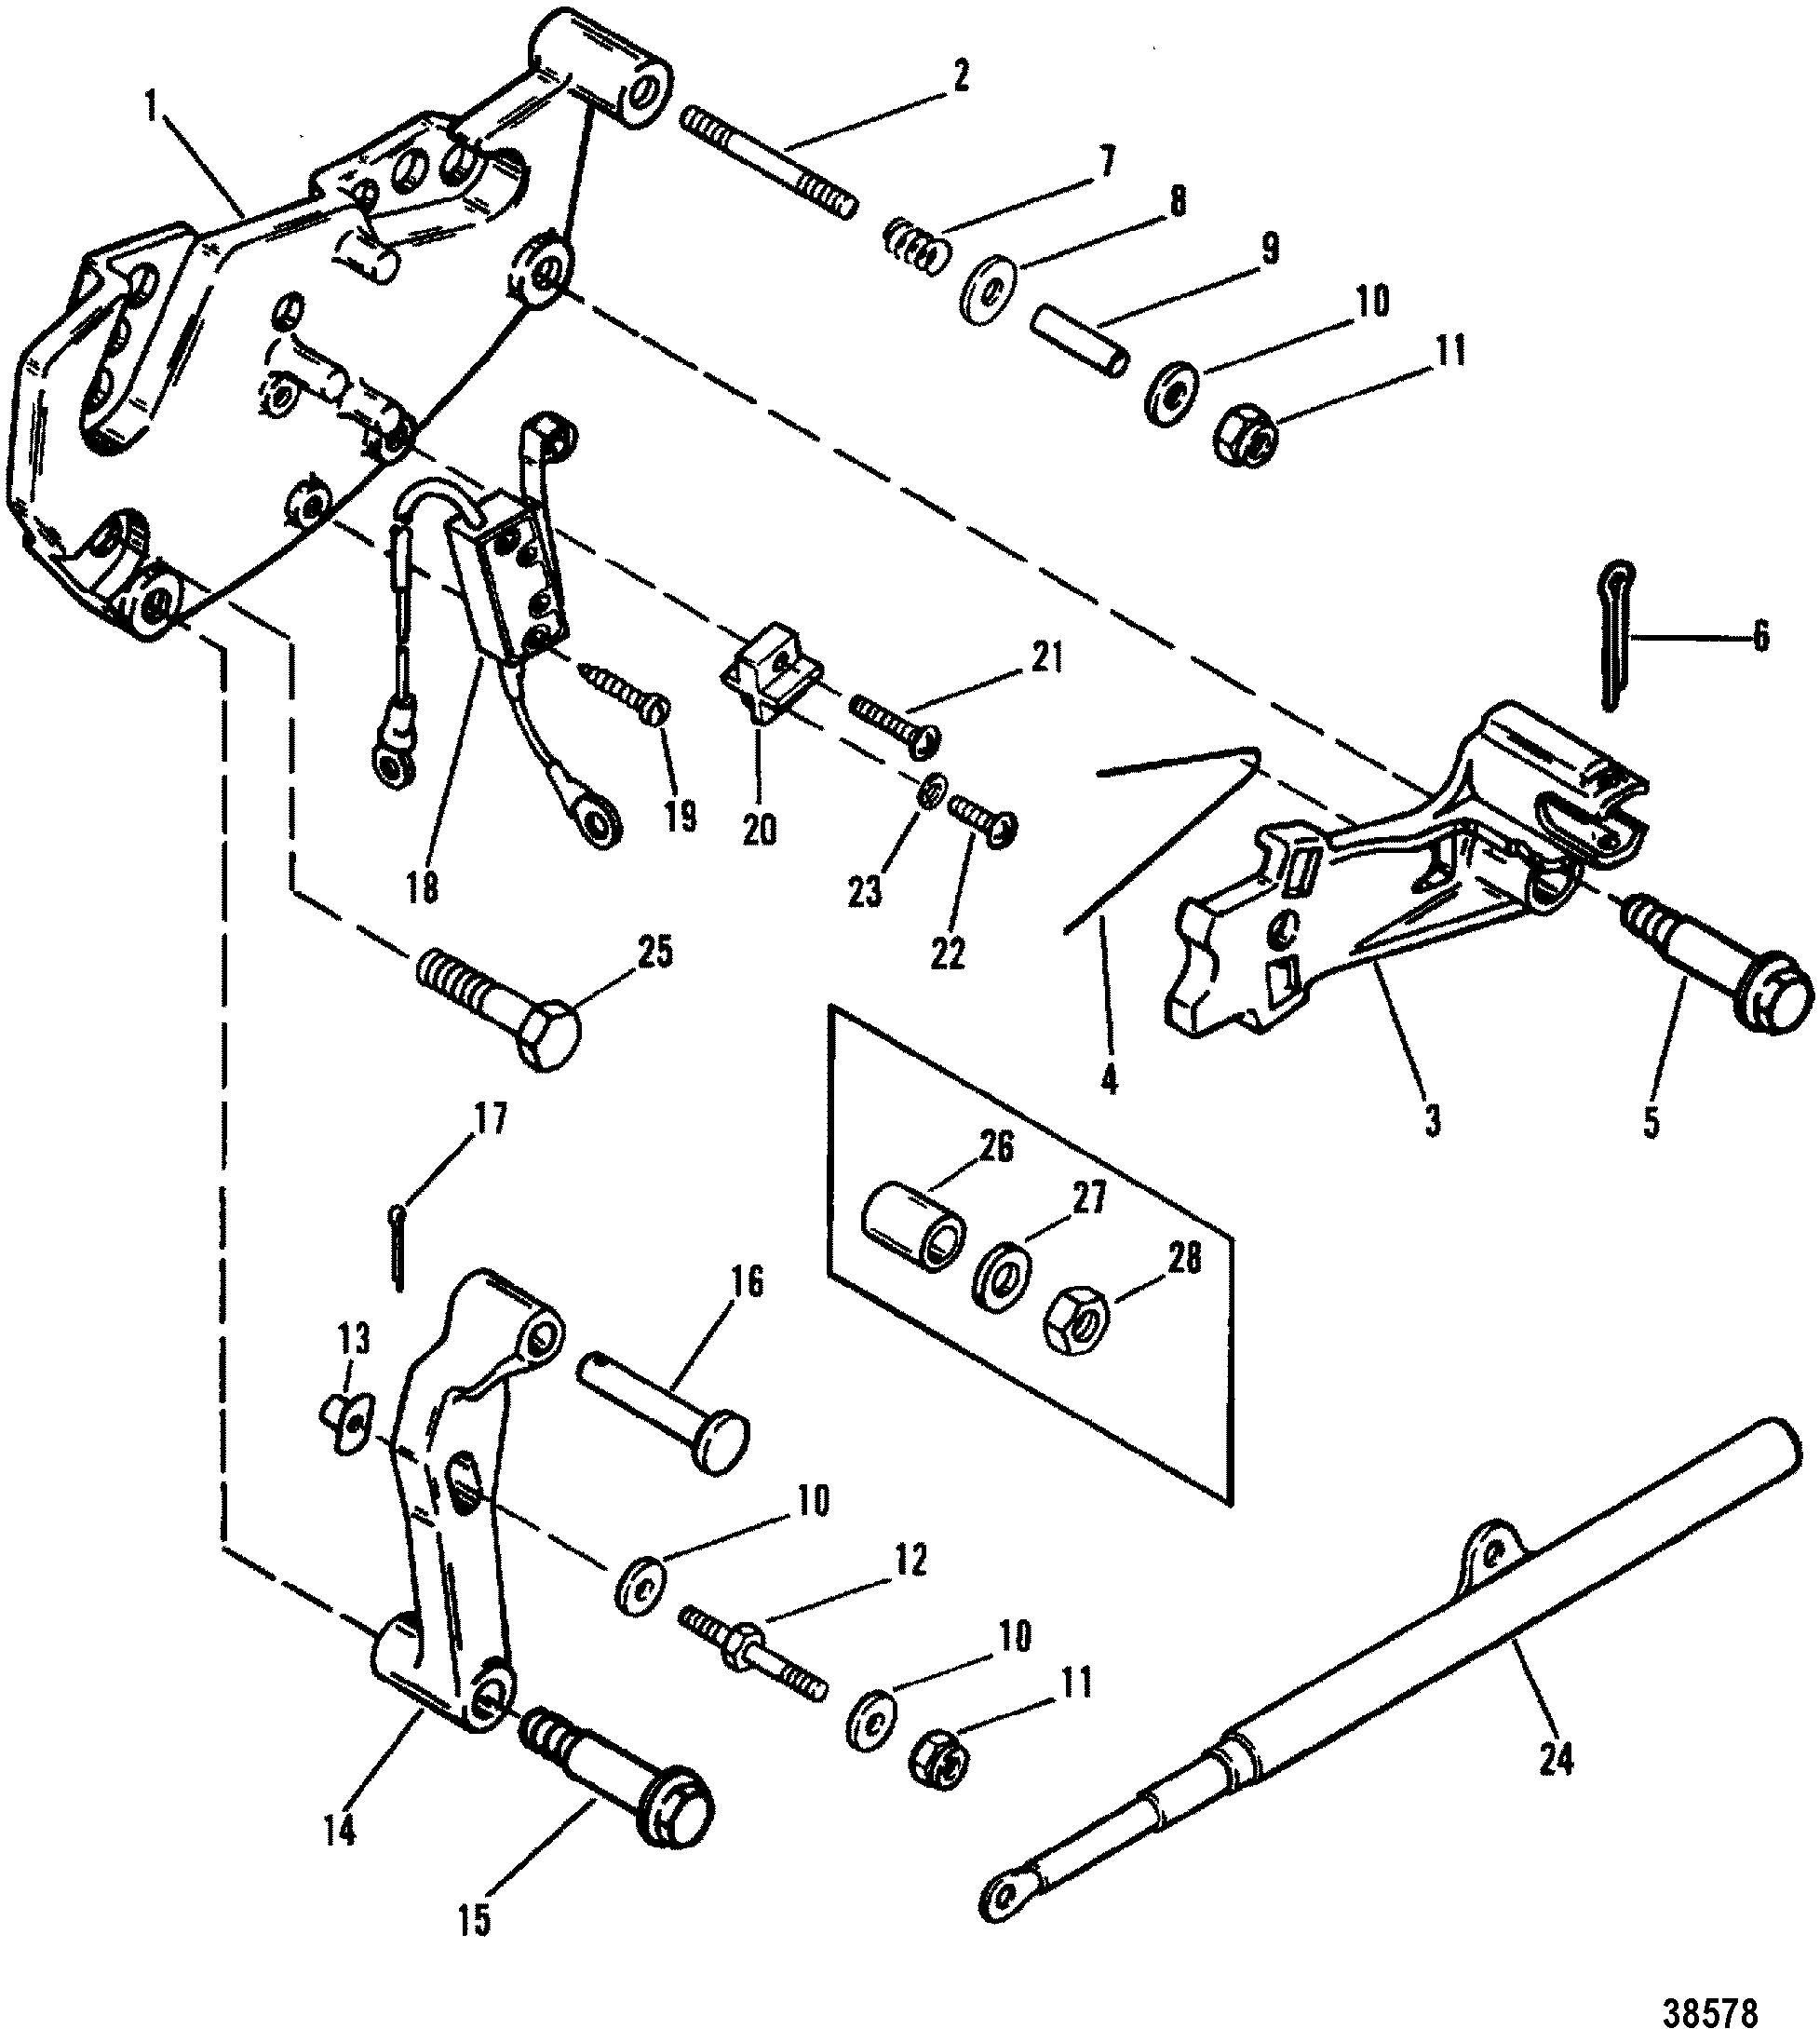 SHIFT BRACKET ALPHA ENGINES FOR MERCRUISER 200/5.0L/LX 260